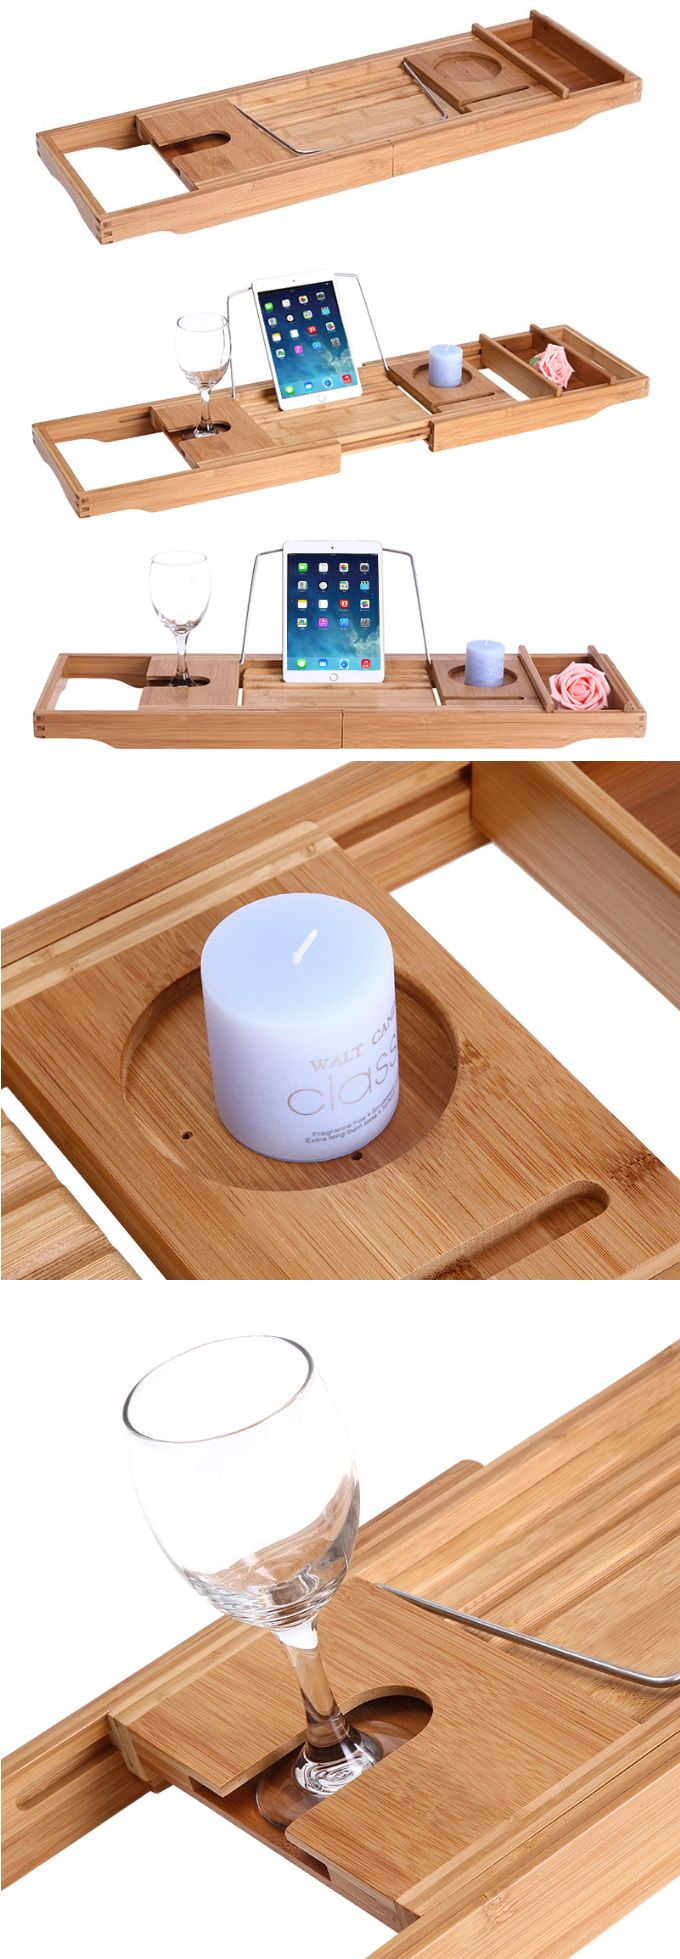 Bamboo Wooden Bathtub Caddy Tray Office Desk Stationery